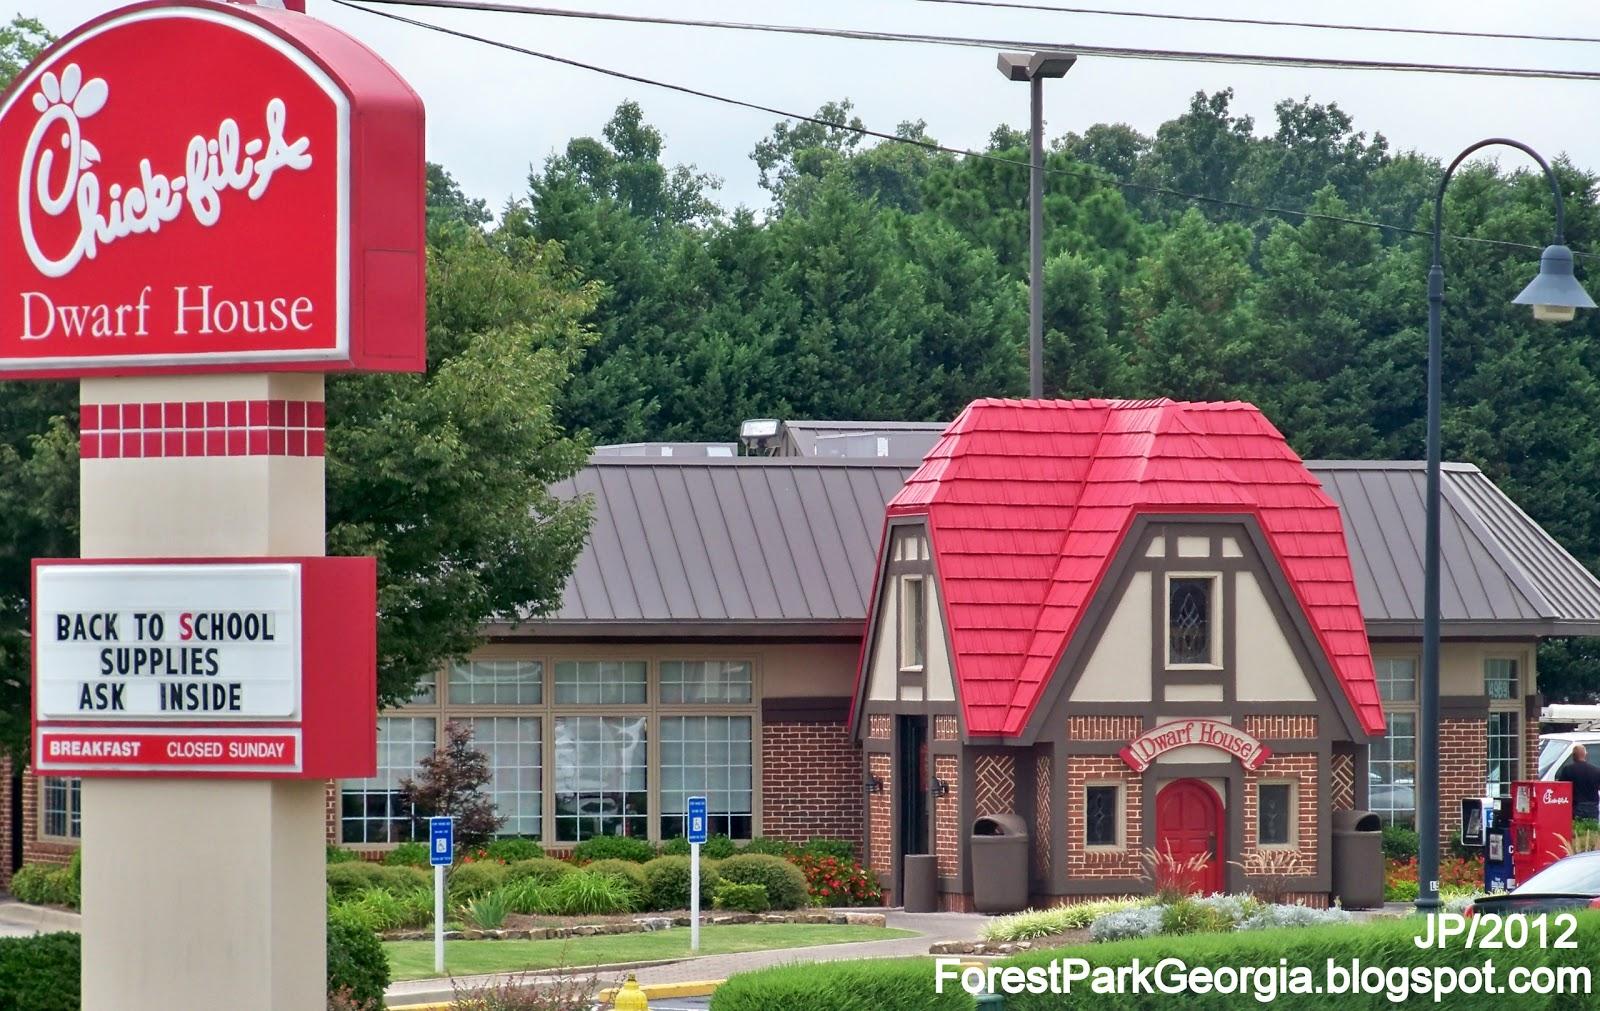 FOREST PARK GEORGIA Clayton County Restaurant Attorney Bank